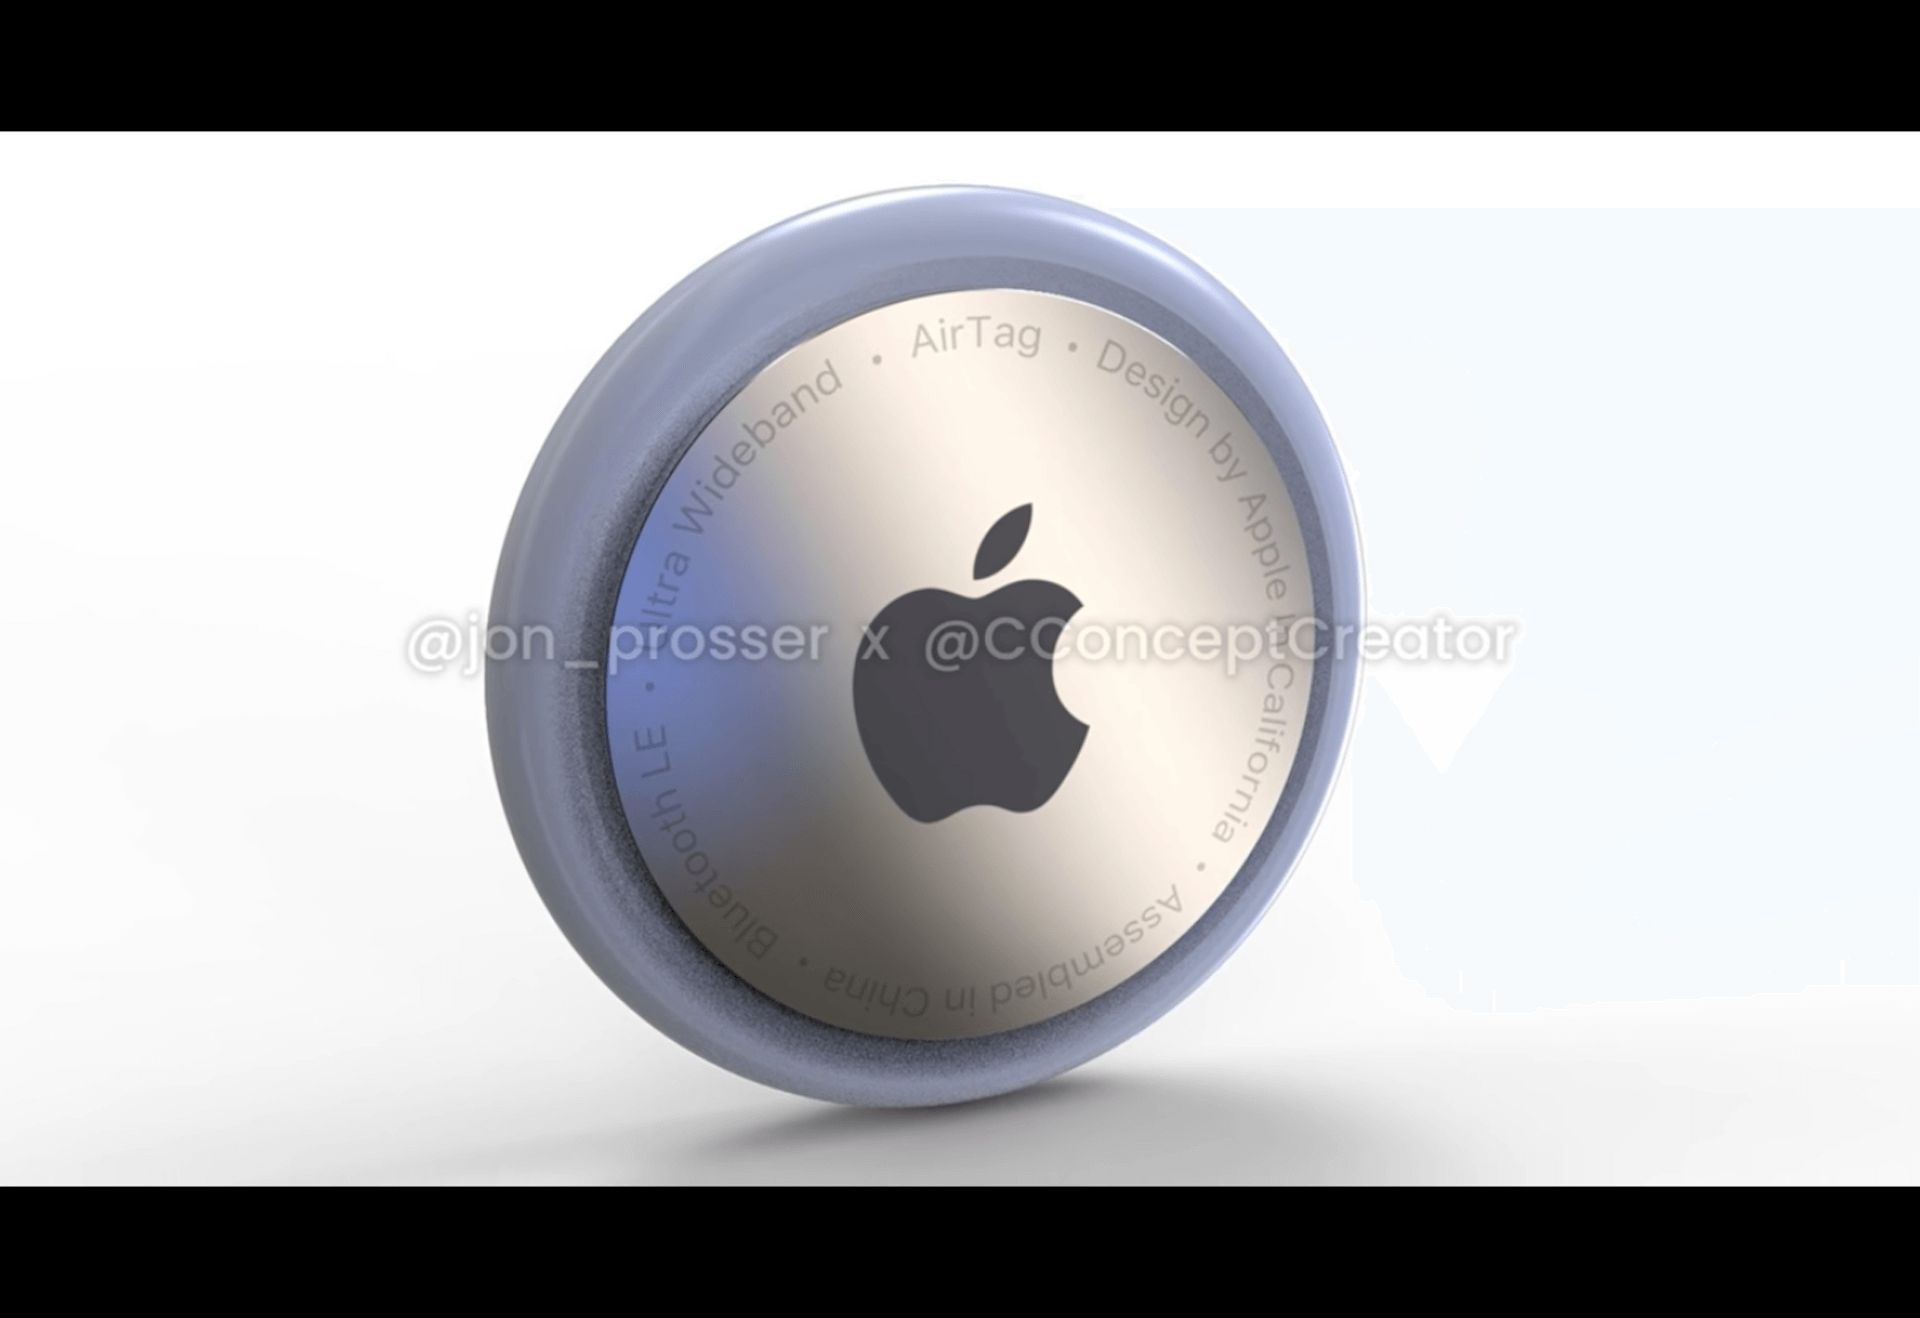 Appleの忘れ物防止タグ・AirTagsの性能試験がまもなく終了?11月中に登場の可能性 tech201026_airtags_main